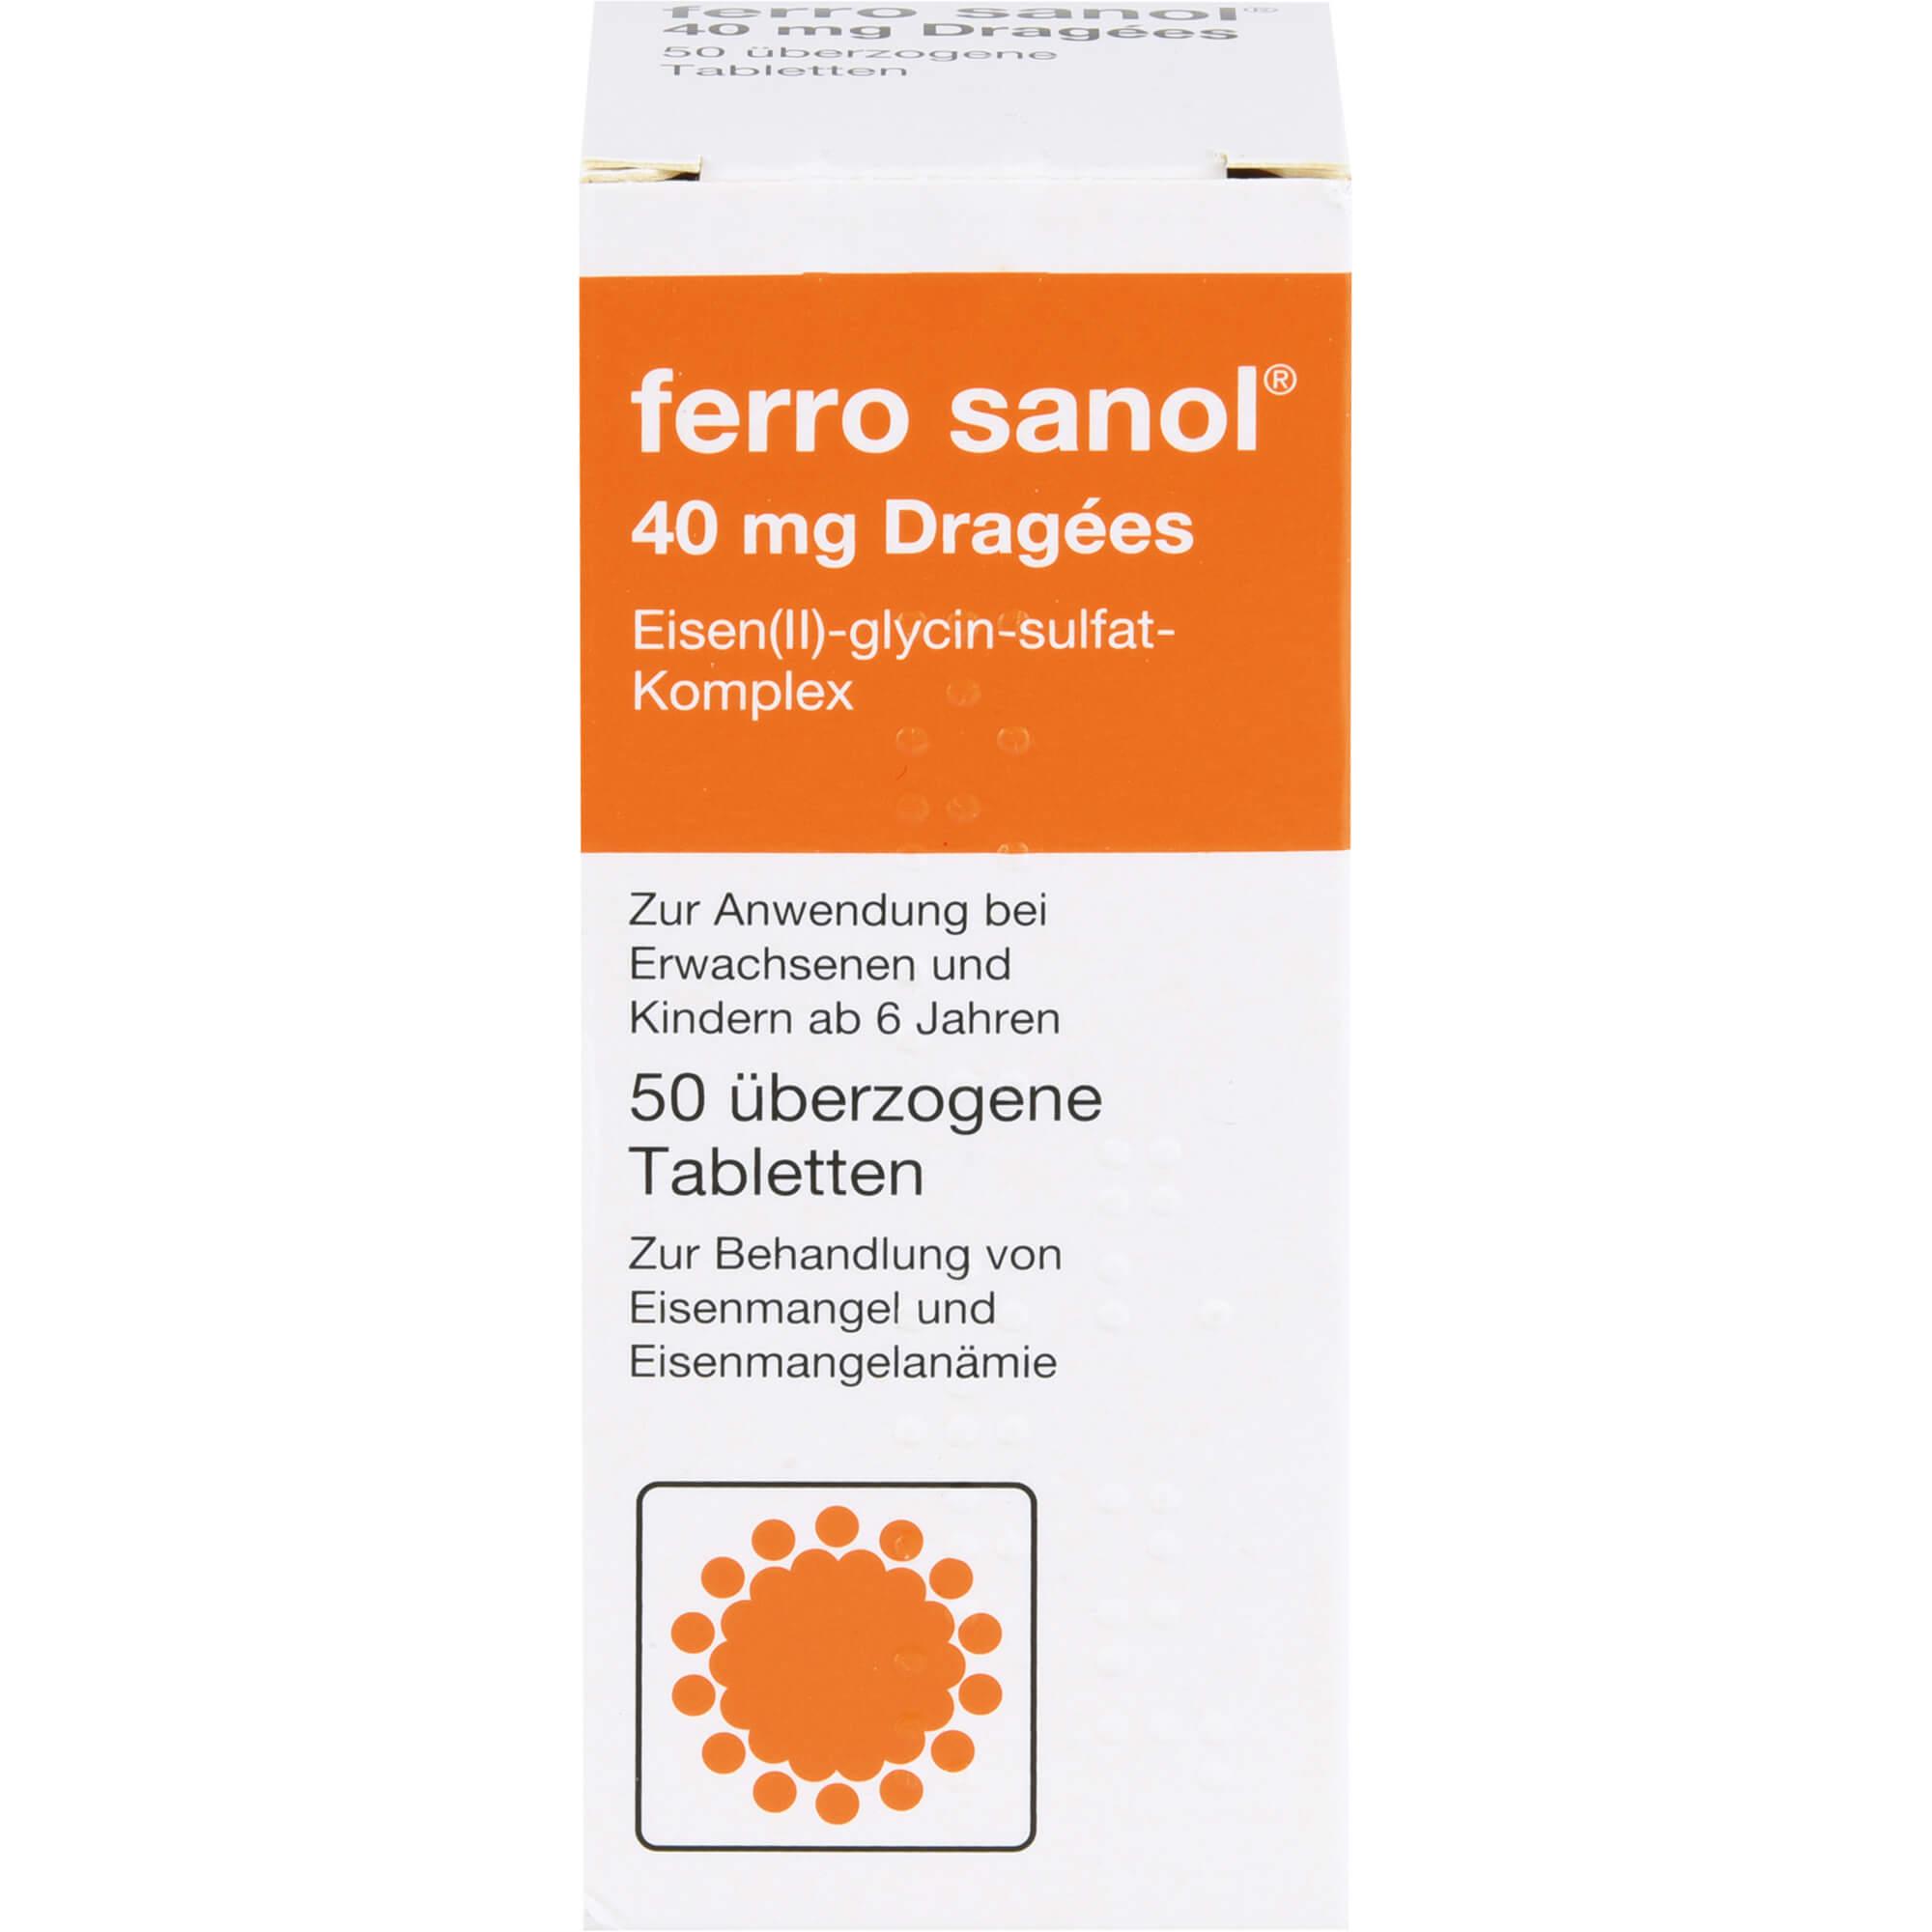 FERRO SANOL überzogene Tabletten